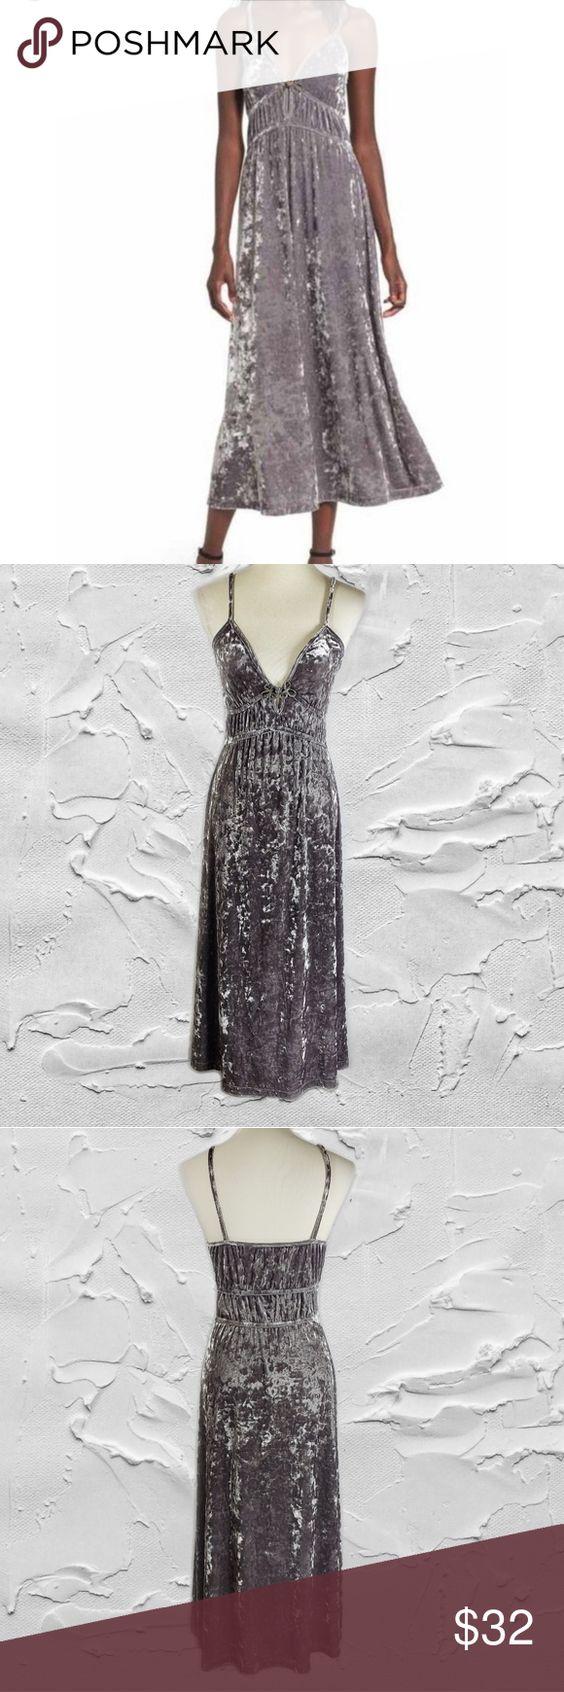 Bp Gray Velvet Spaghetti Strap Maxi Dress Sz S Bp Womens Gray Velvet Spaghetti Strap Maxi Dress Sz S Sleeveless Maxi Dress Dresses Spaghetti Strap Maxi Dress [ 1692 x 564 Pixel ]